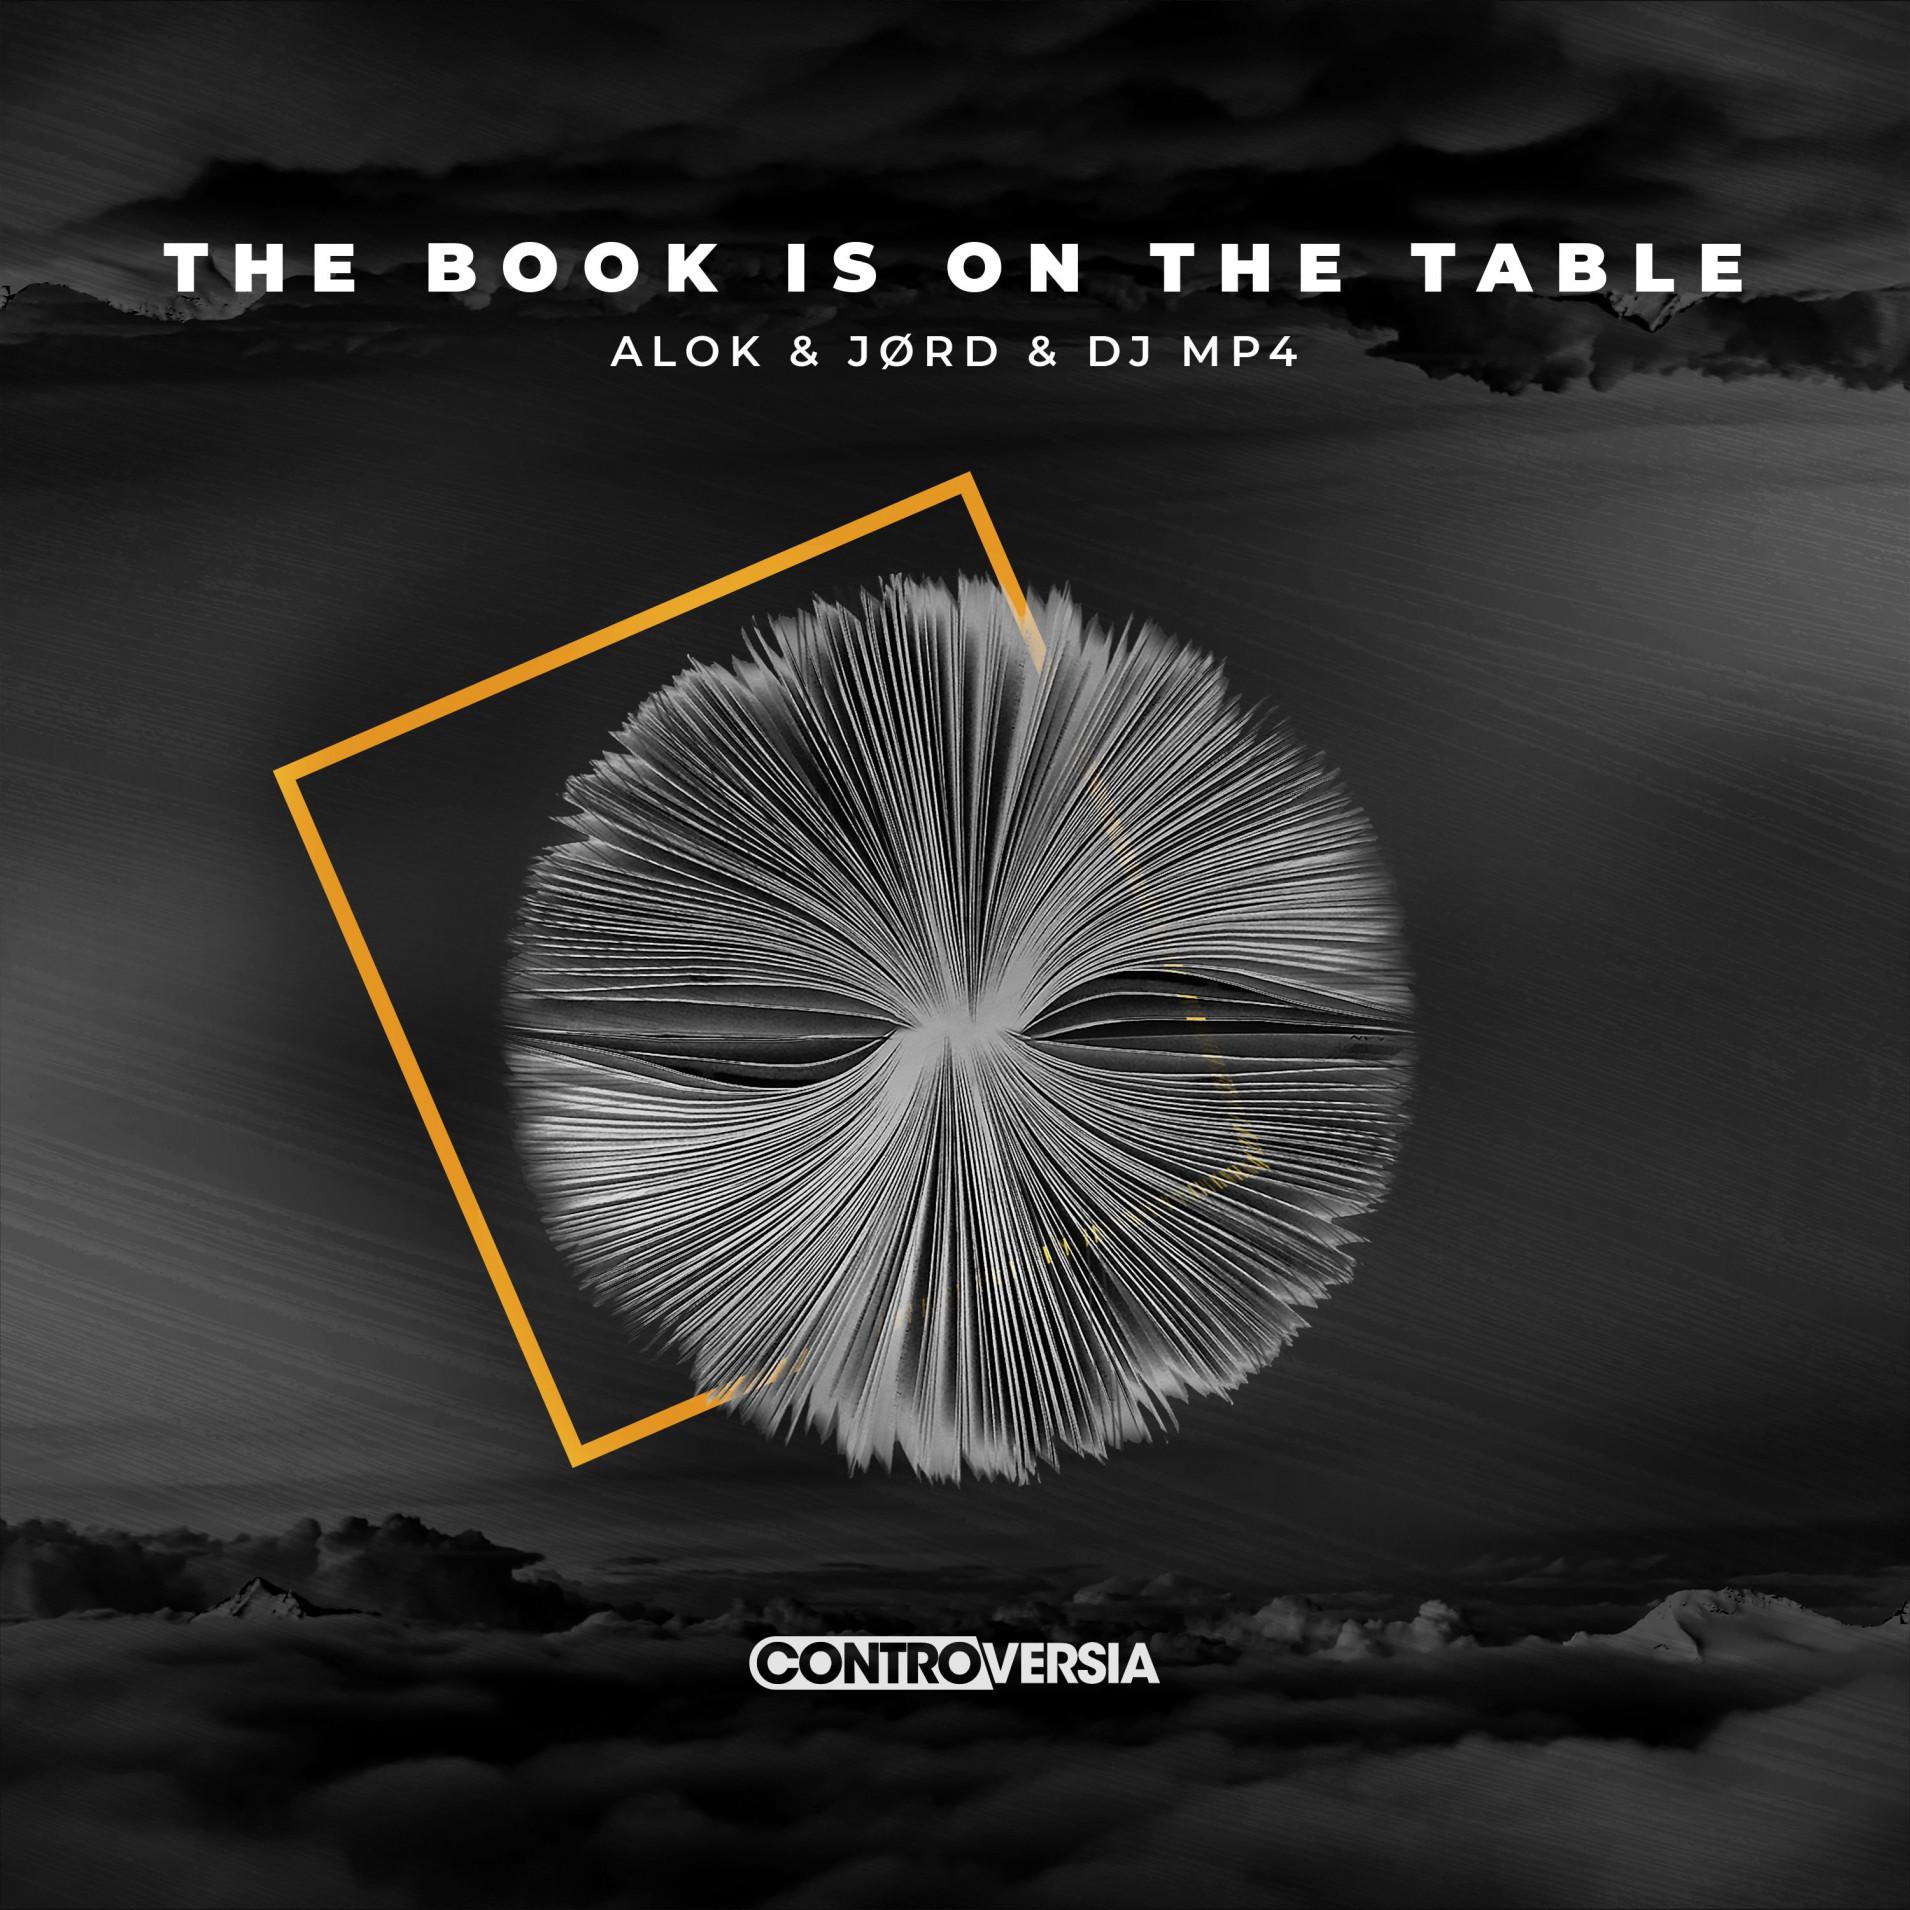 Alok  'The Book Is On The Table' ile ilgili görsel sonucu